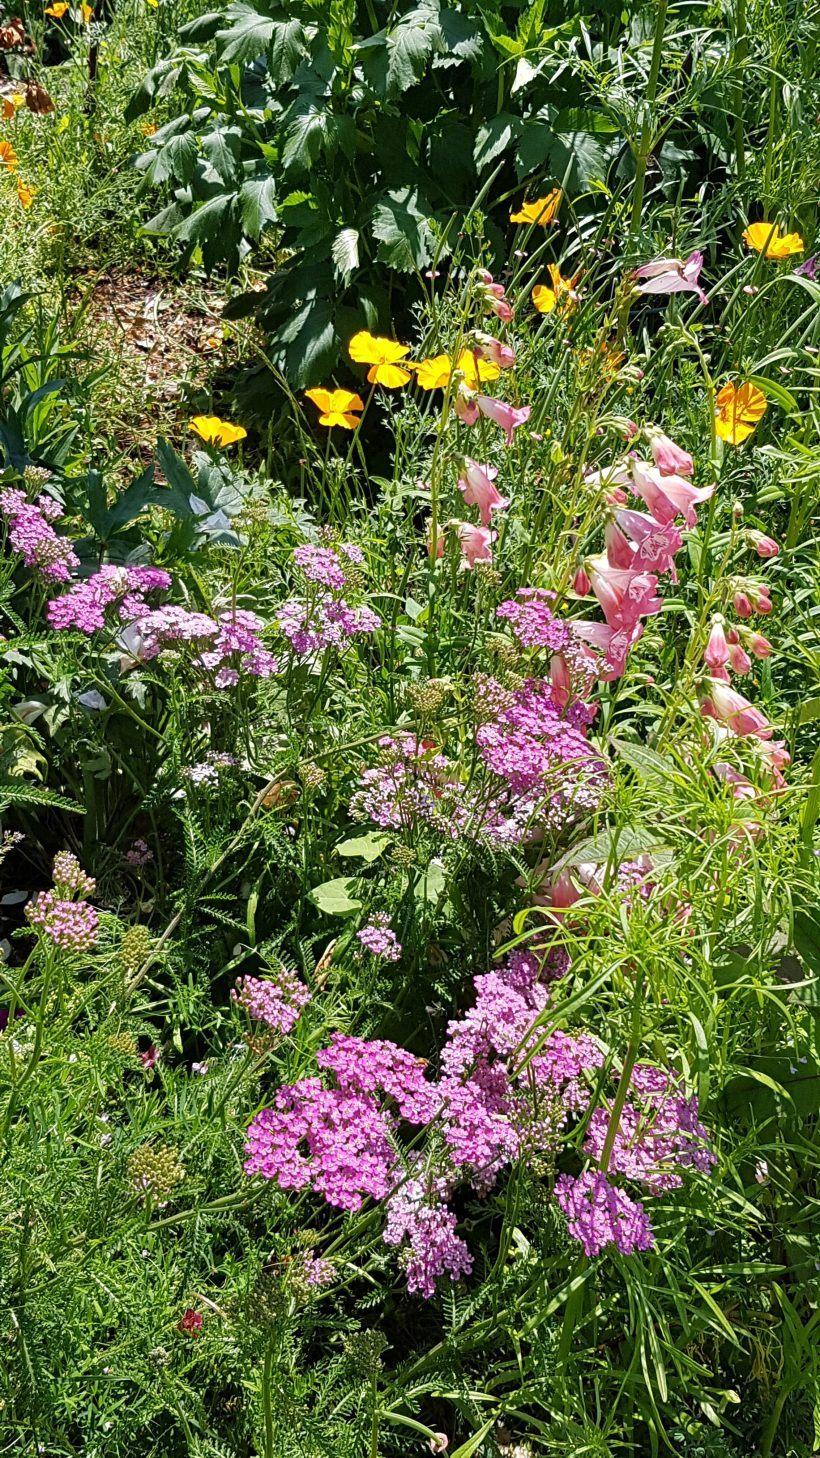 Le jardin d'Esprit Laïta en juin - La terrassse